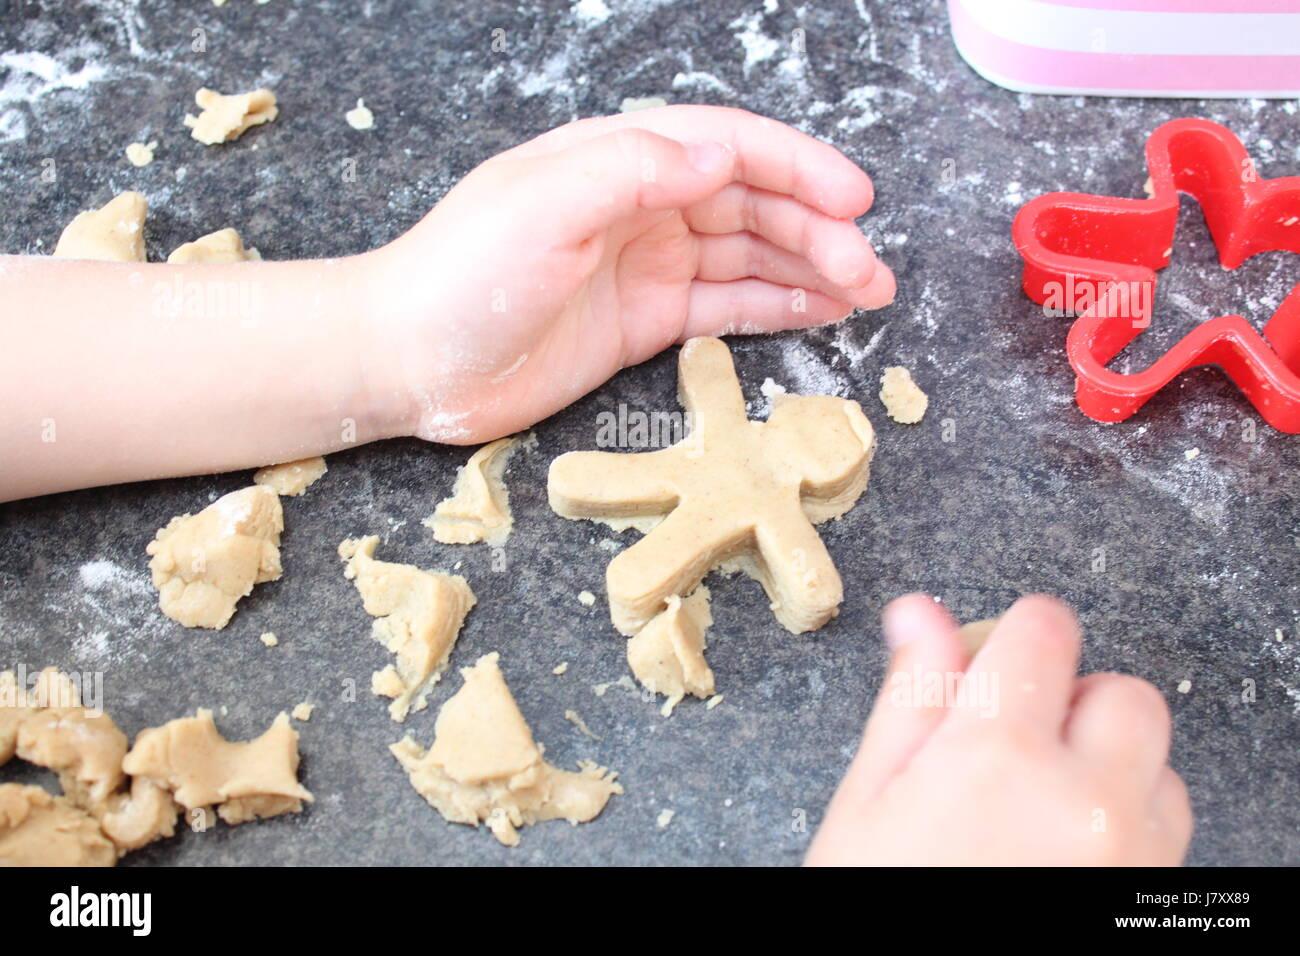 Children's hands making Gingerbread men - Stock Image